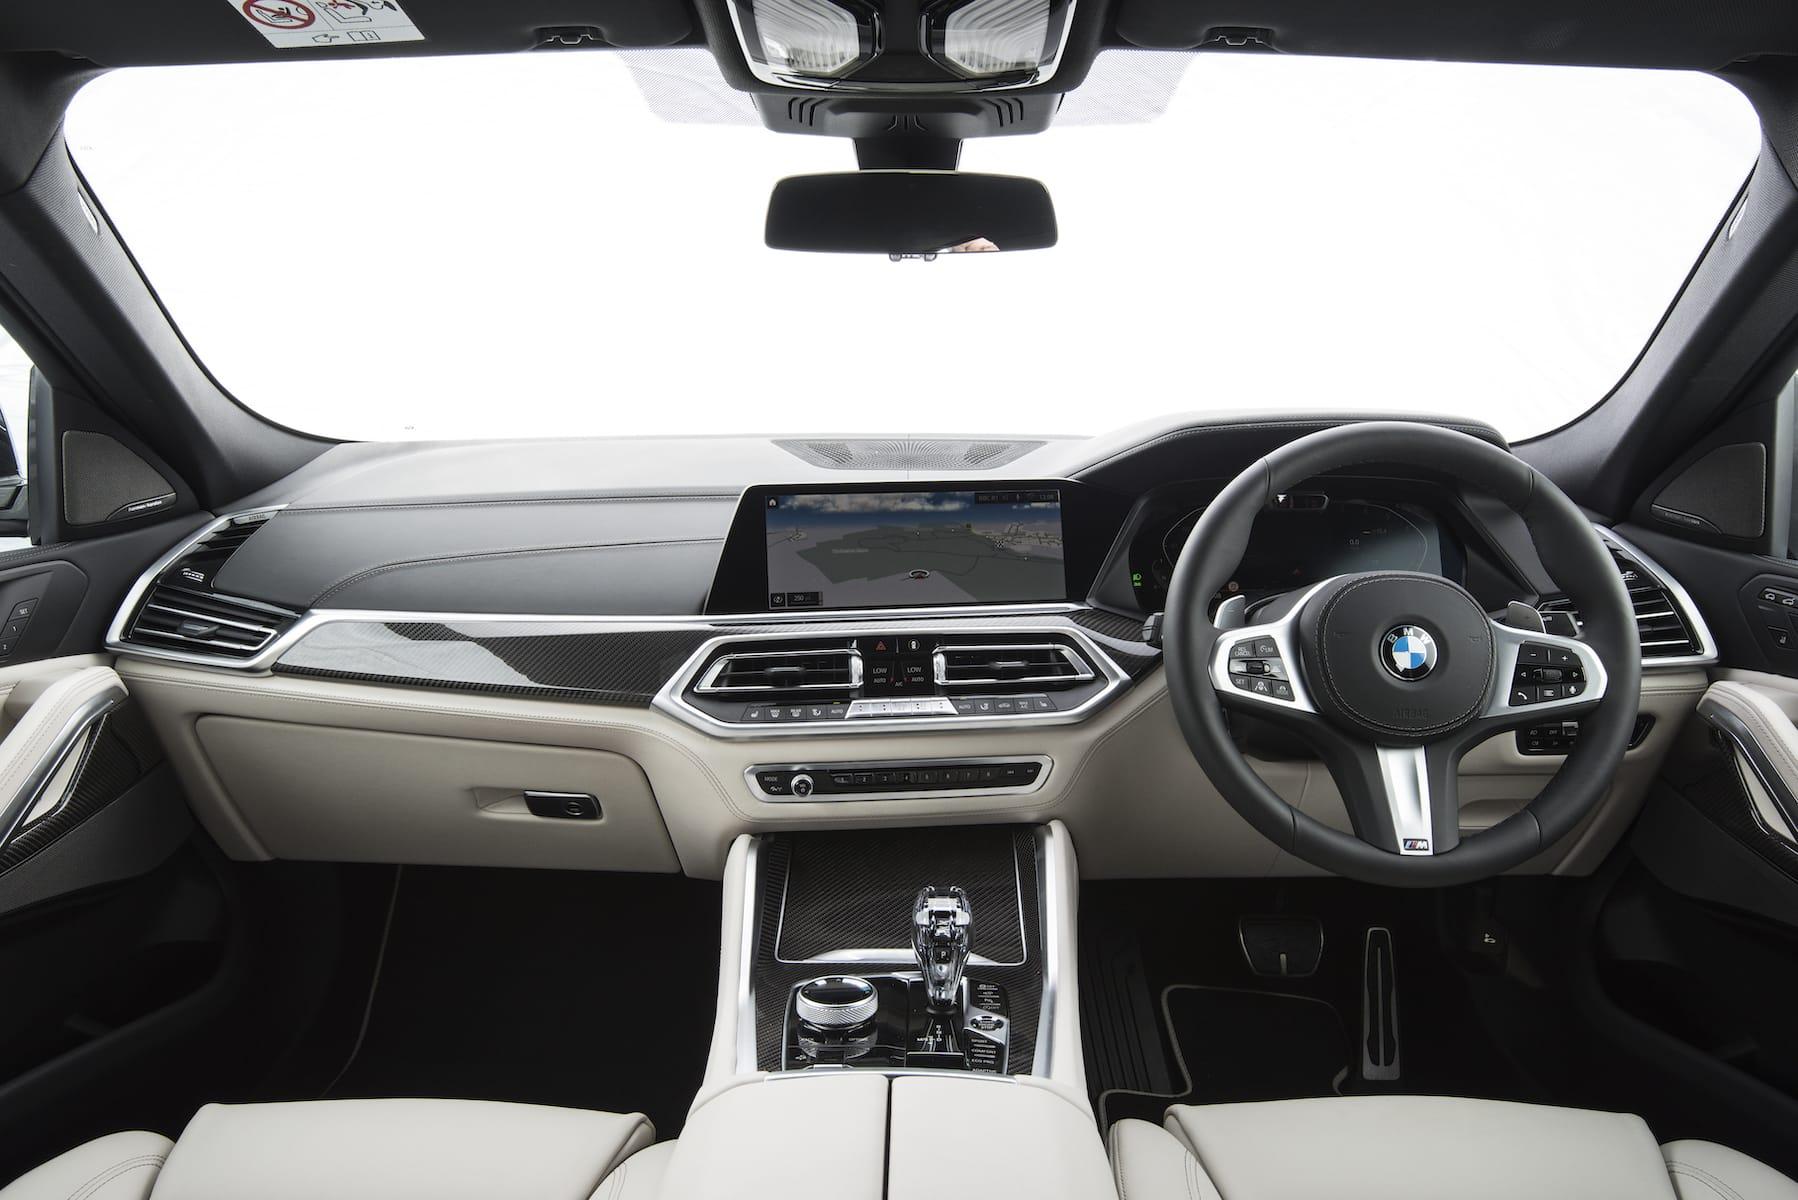 BMW X6 (2020 onwards) – interior and dashboard